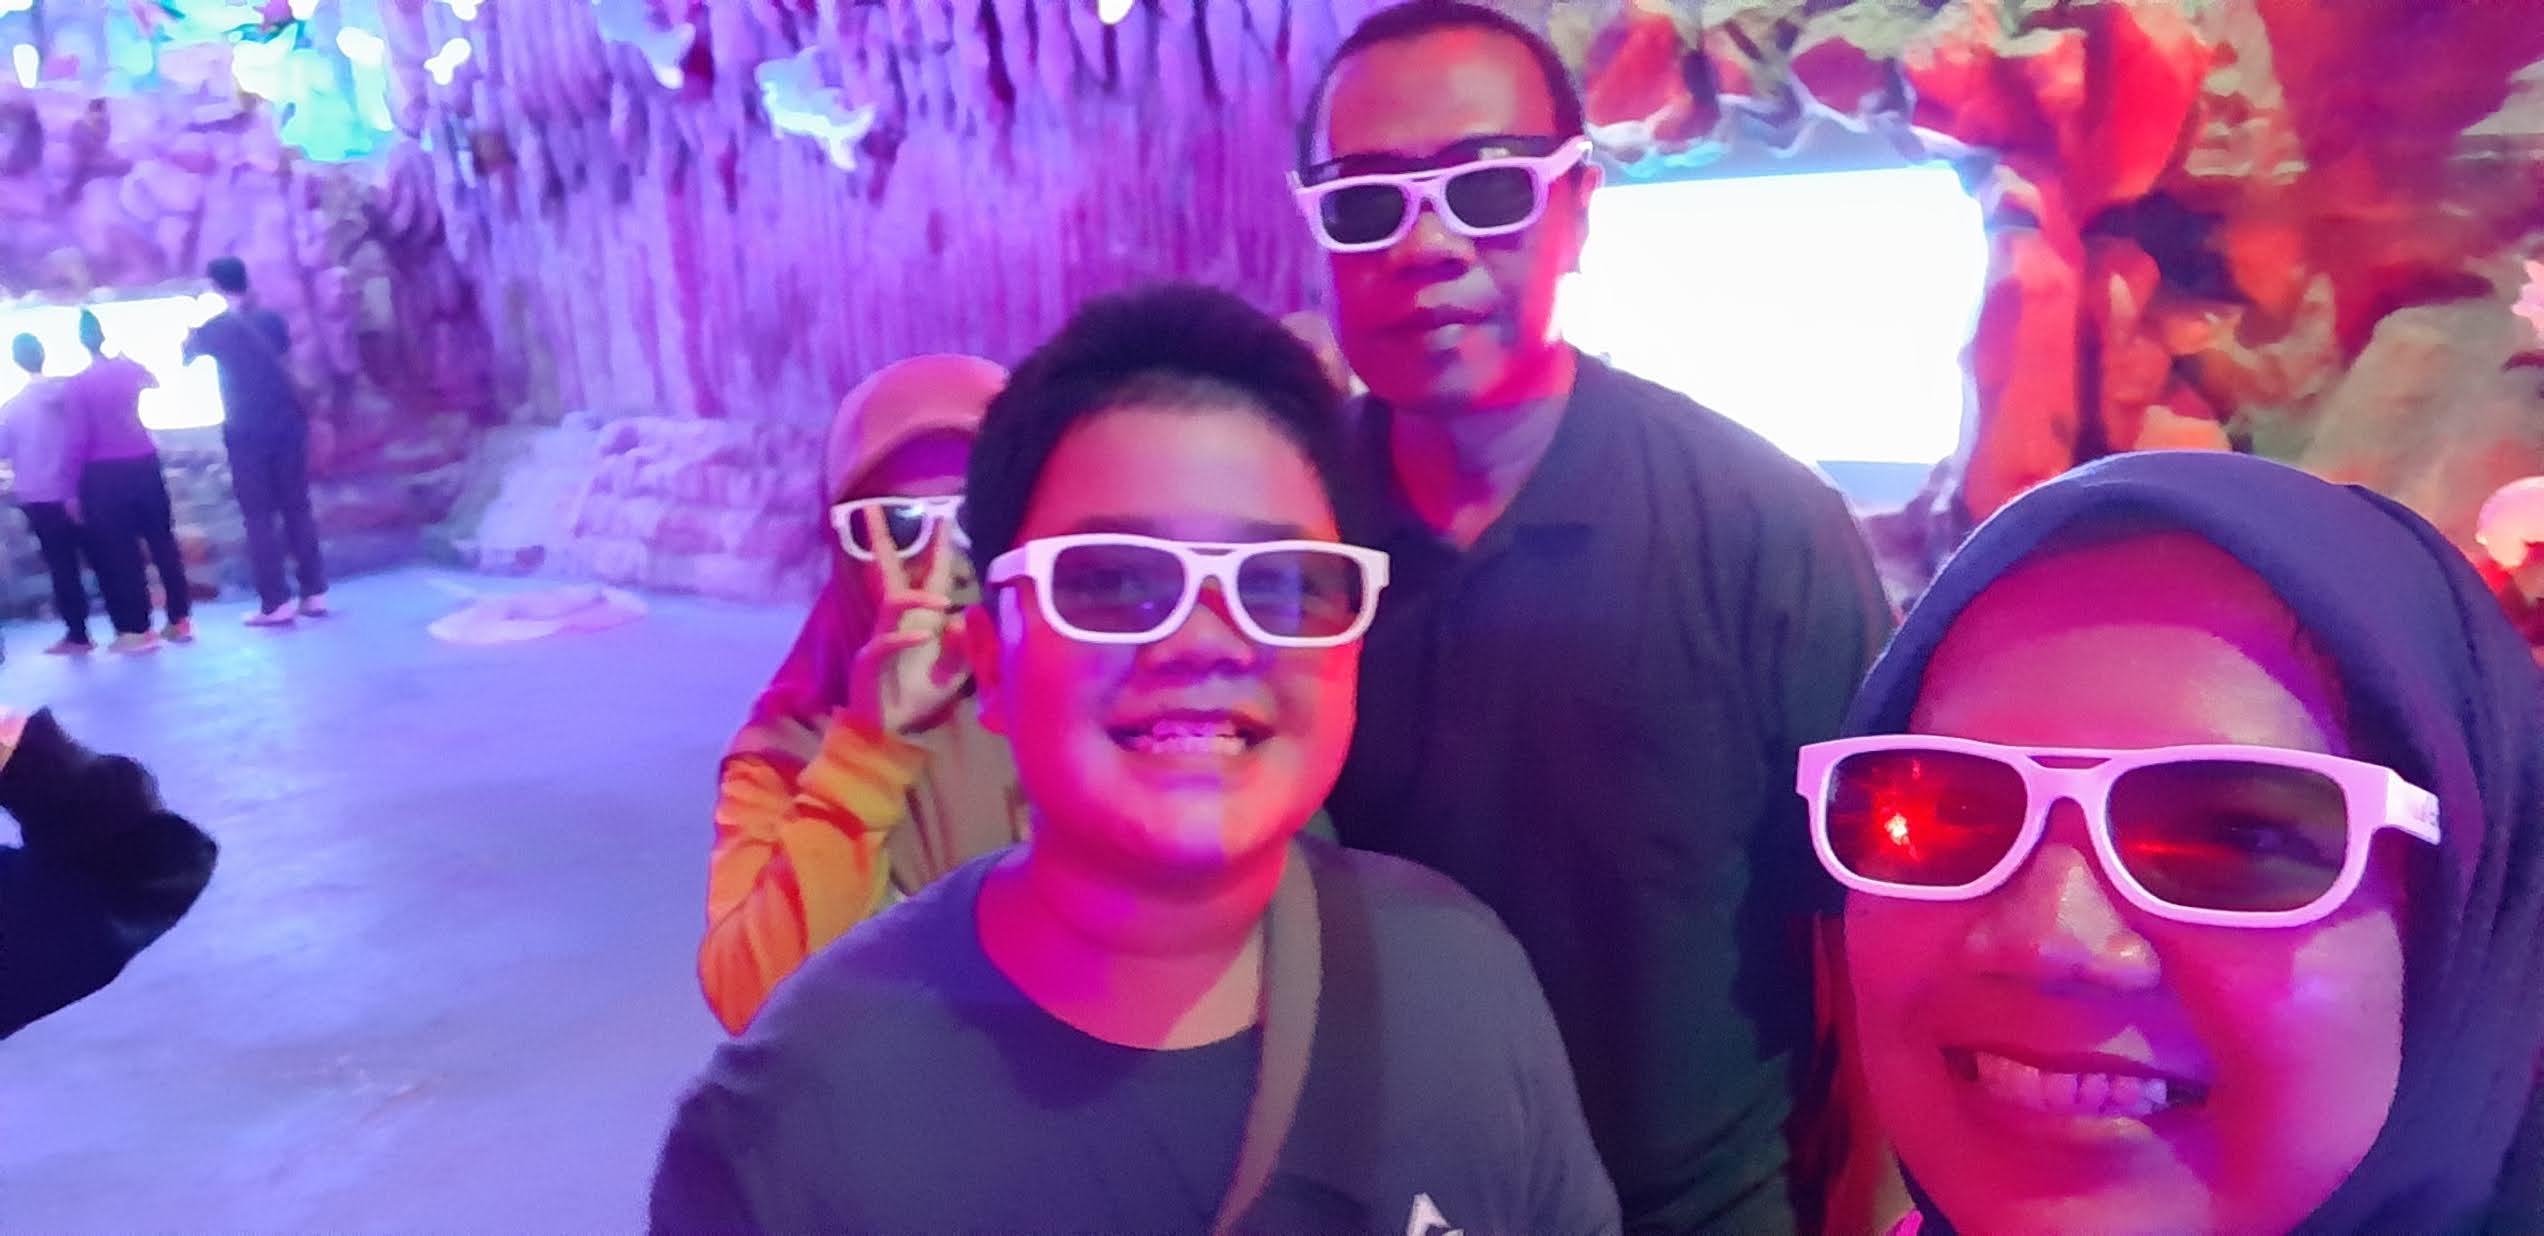 jatim-park-3--harga-promo-tiket-terusan-dino-park-the-legend-star-museum-musik-indonesia-nurul-sufitri-travel-lifestyle-blogger